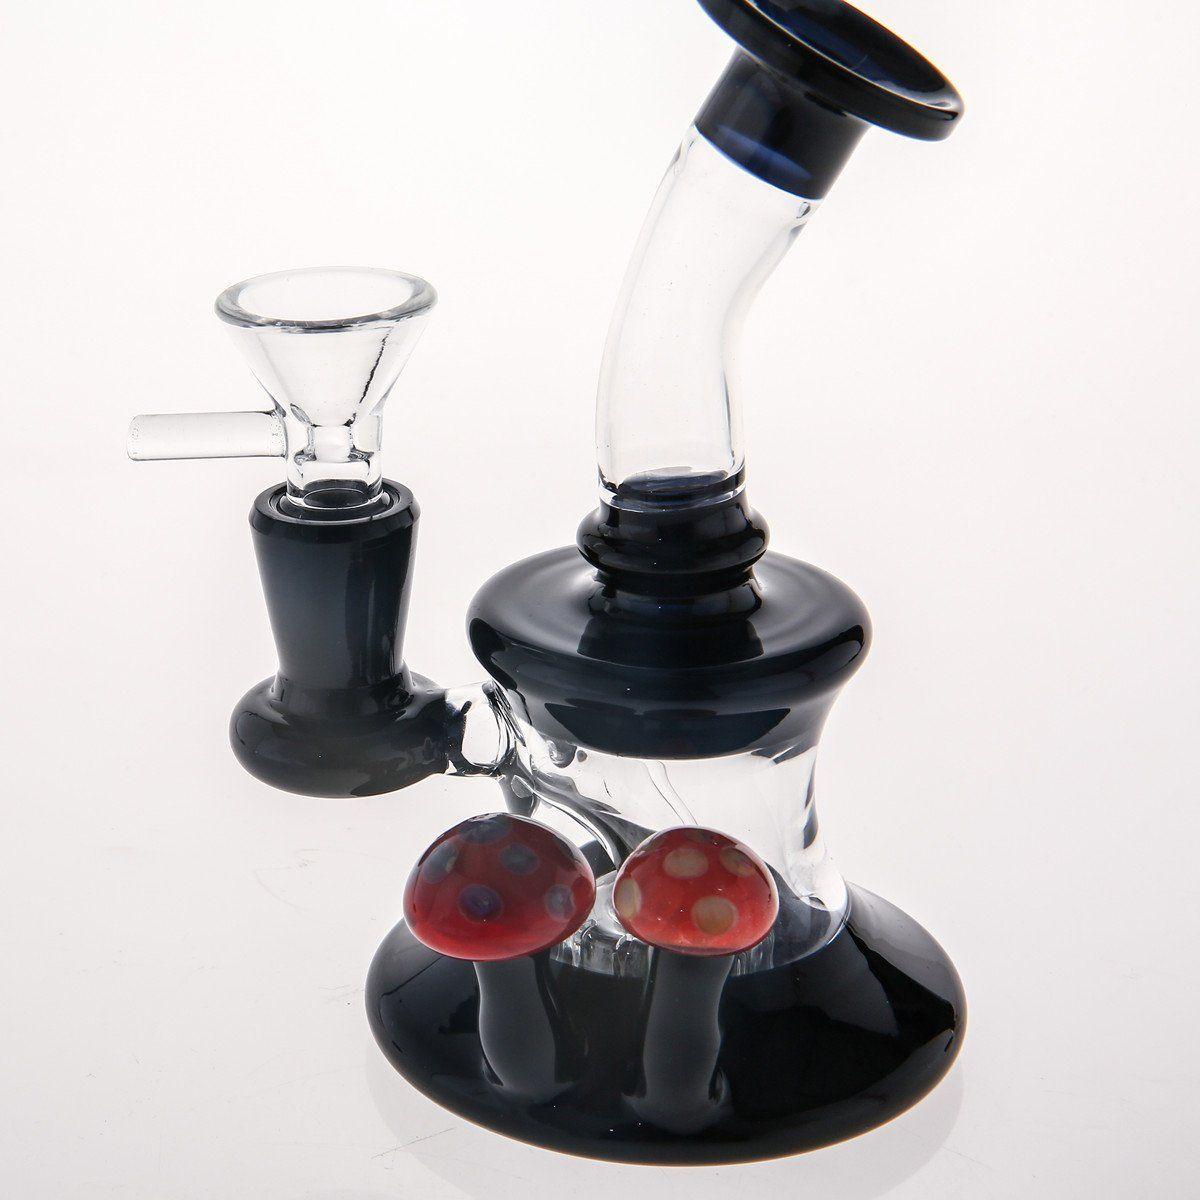 15cm Mini Black Glass Pipe Match 14.4mm Free Glass Bowl Lovely Double Mushroom Glass Bongs Beaker Two Function Hookah Dab Rig Water-Bong